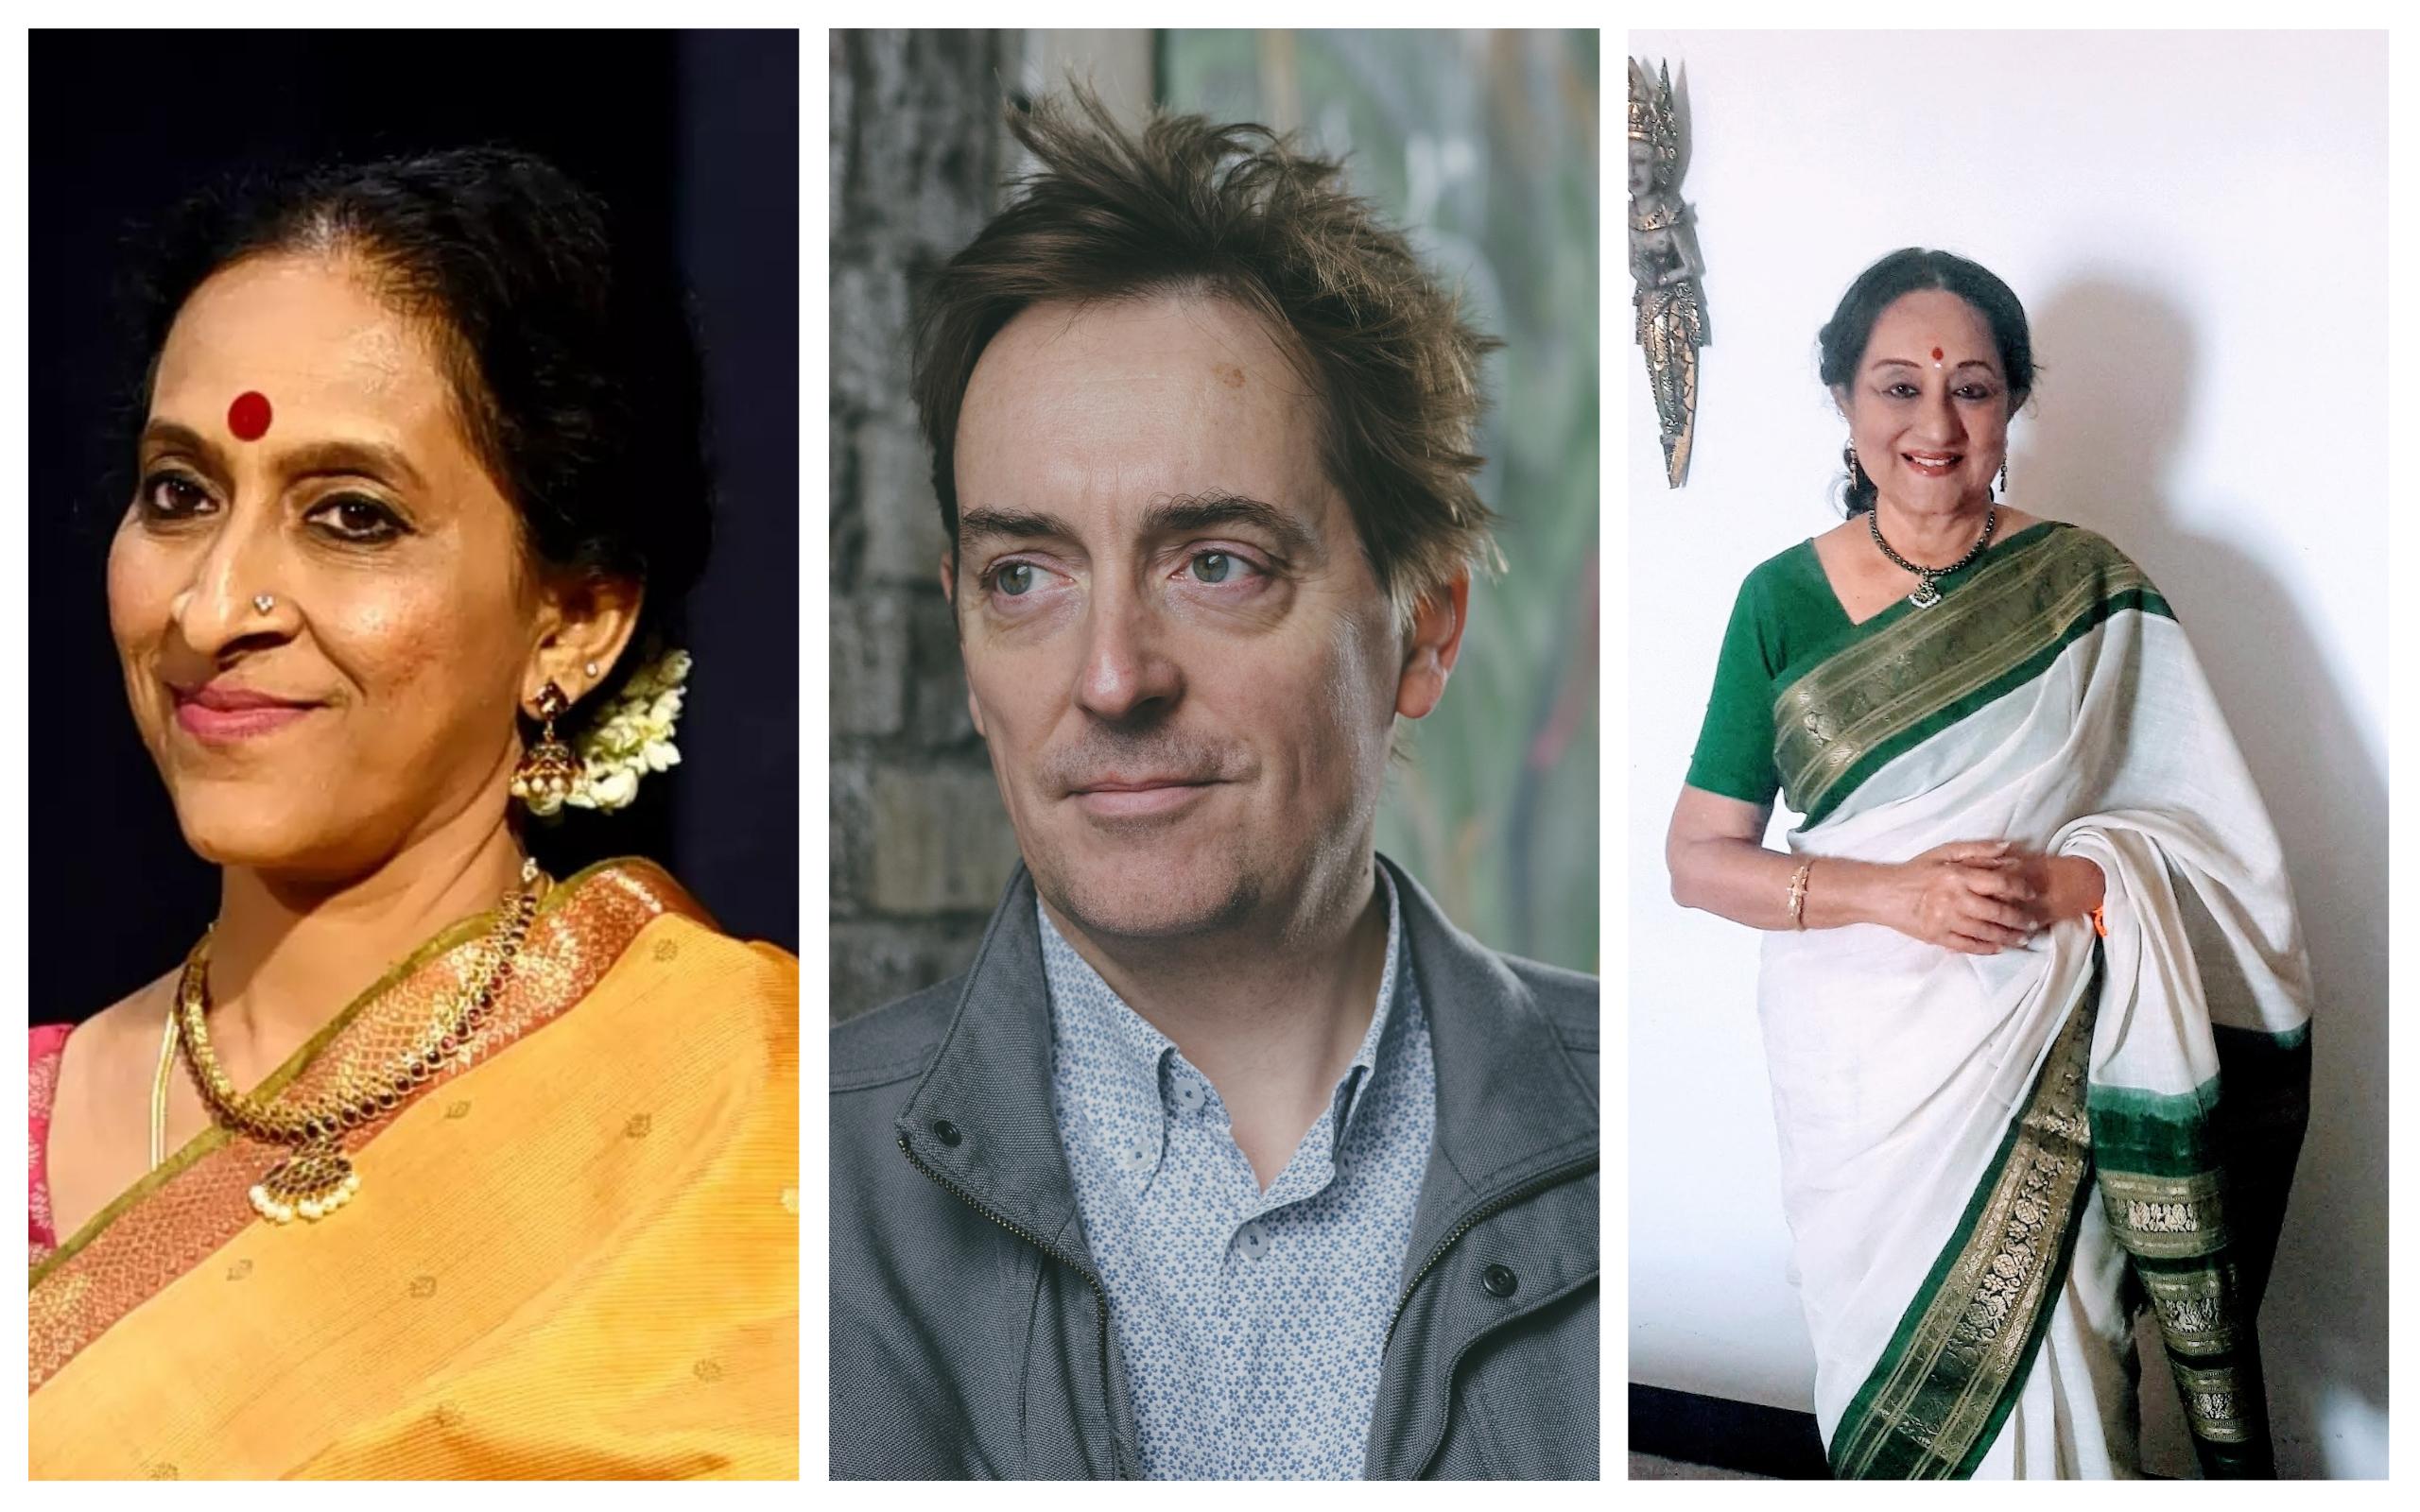 The webinar line-up includes Oscar awardee vocalist Bombay Jayashree; Oliver Craske, who authored Pt Ravi Shankar's memoir, 'Indian Sun' and Lakshmi Vishwanathan hosting a discussion on 'Women of Pride - the Devadasi Tradition'. Photos courtesy: Apsaras Arts, Charlotte Knee